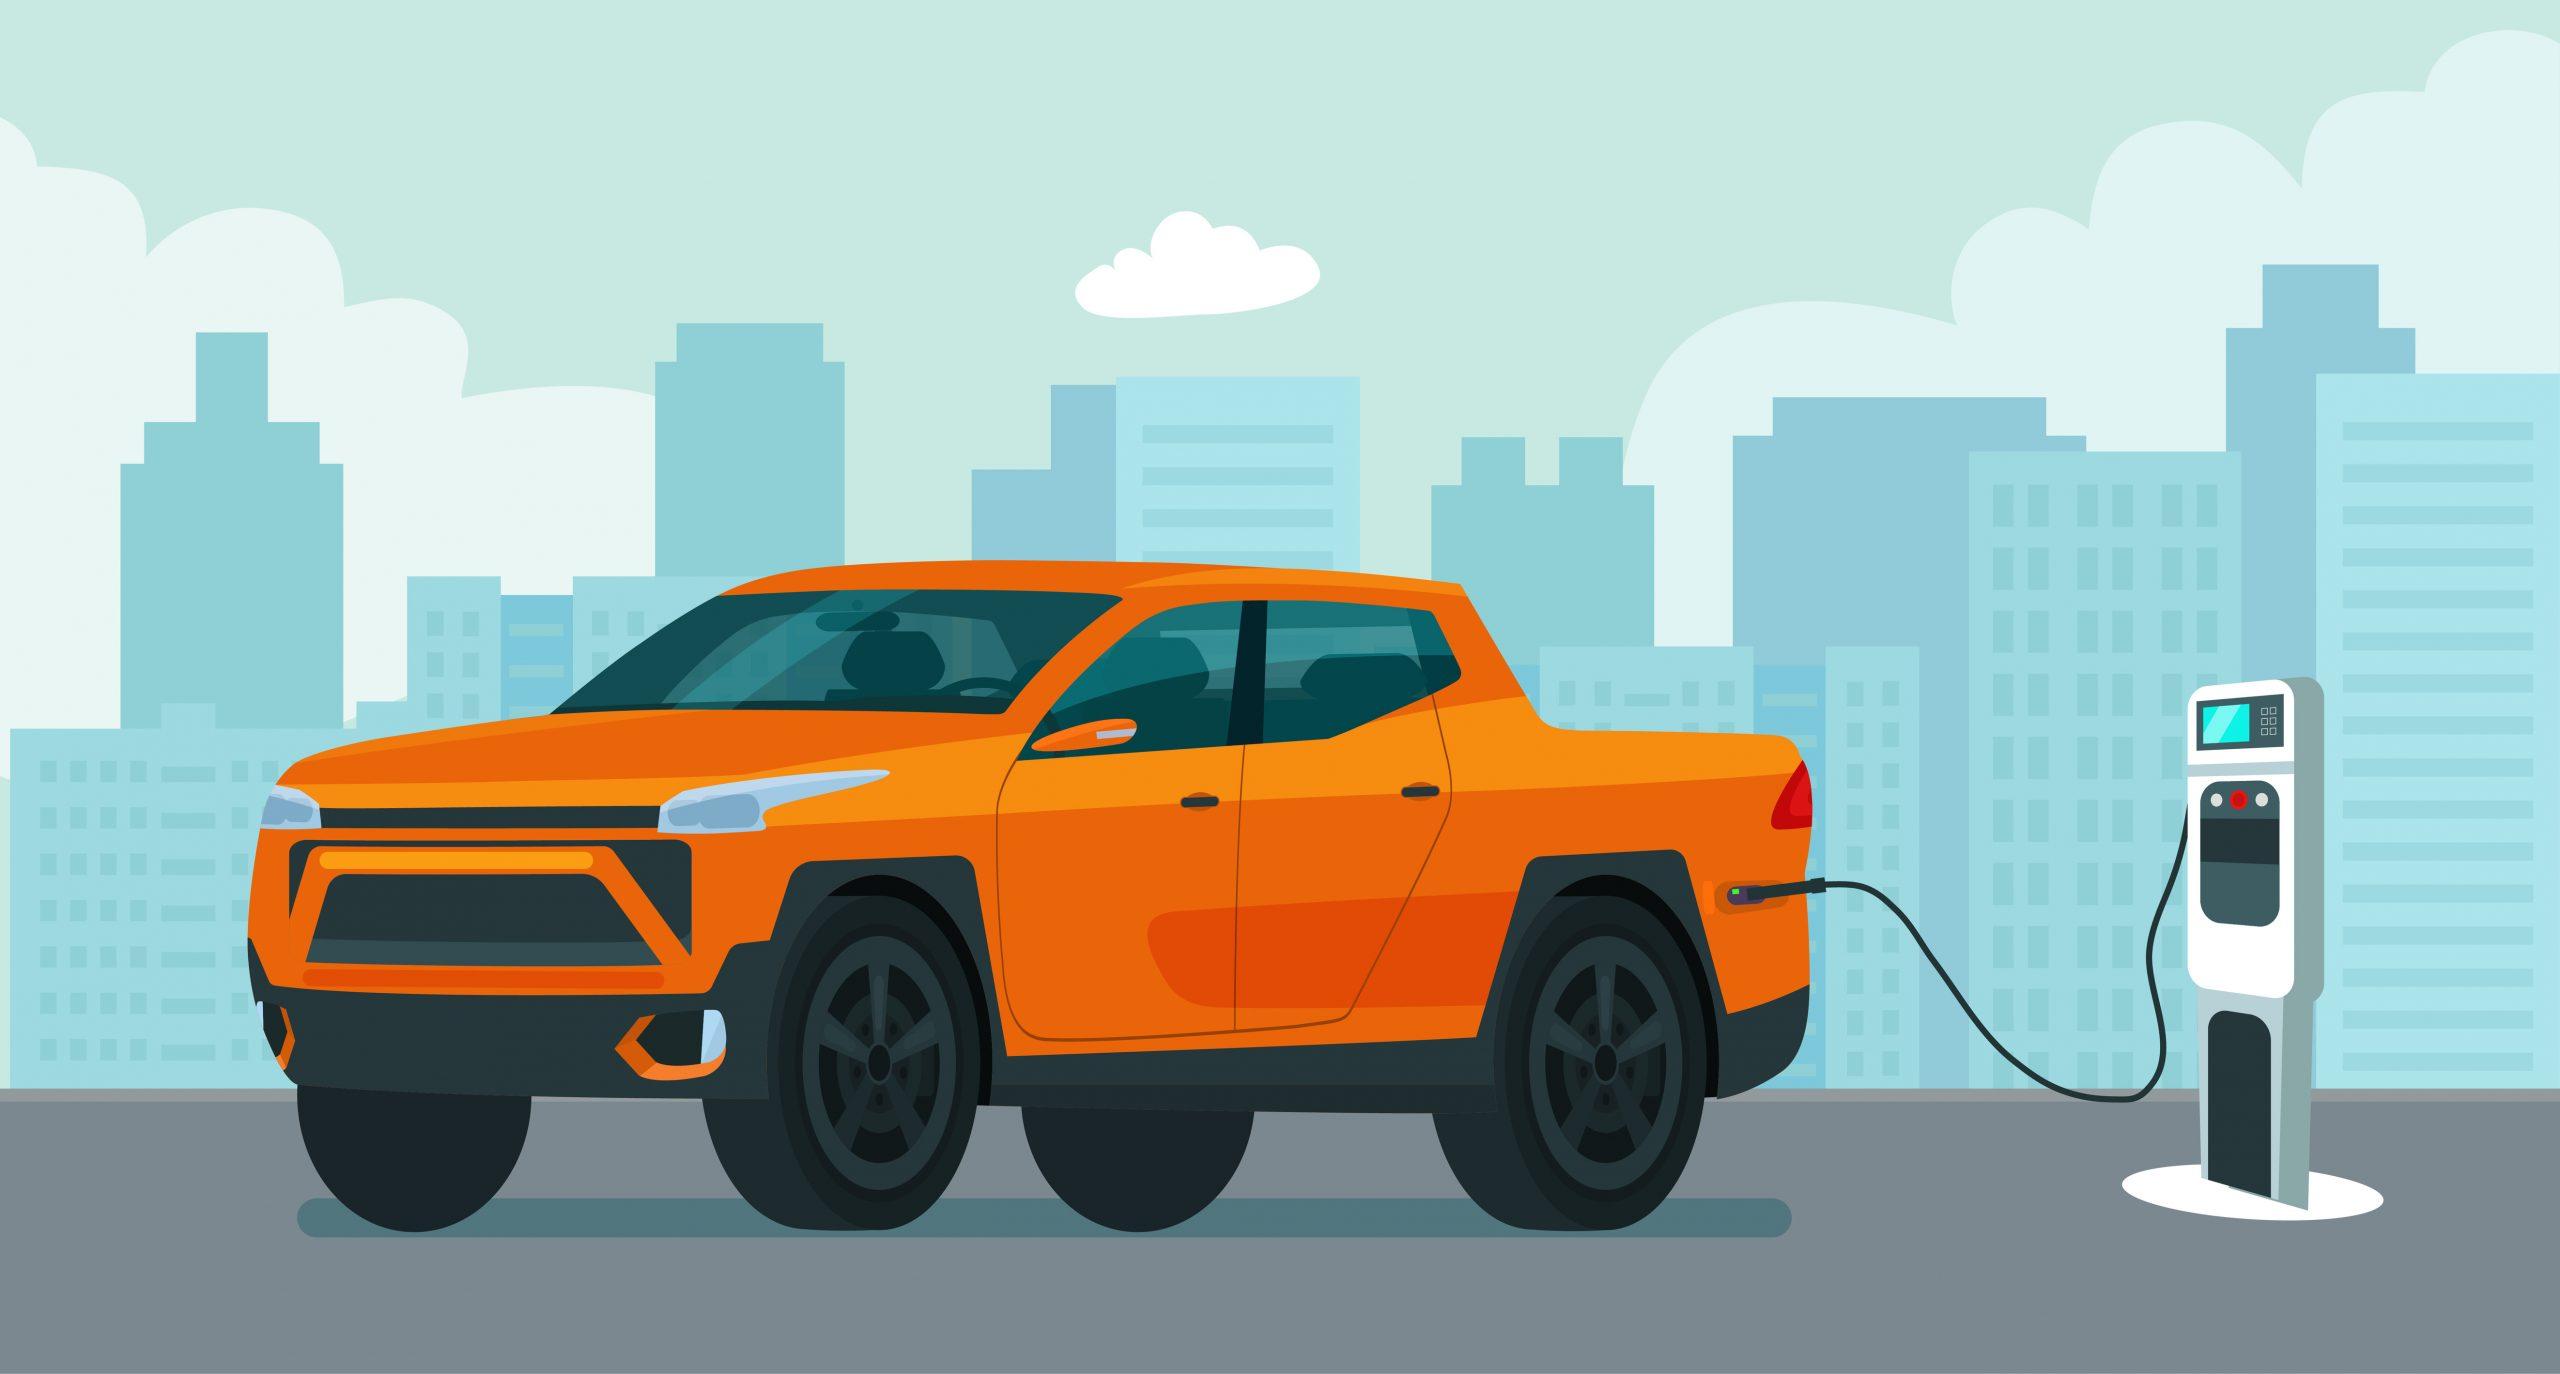 Electric Dodge Ram